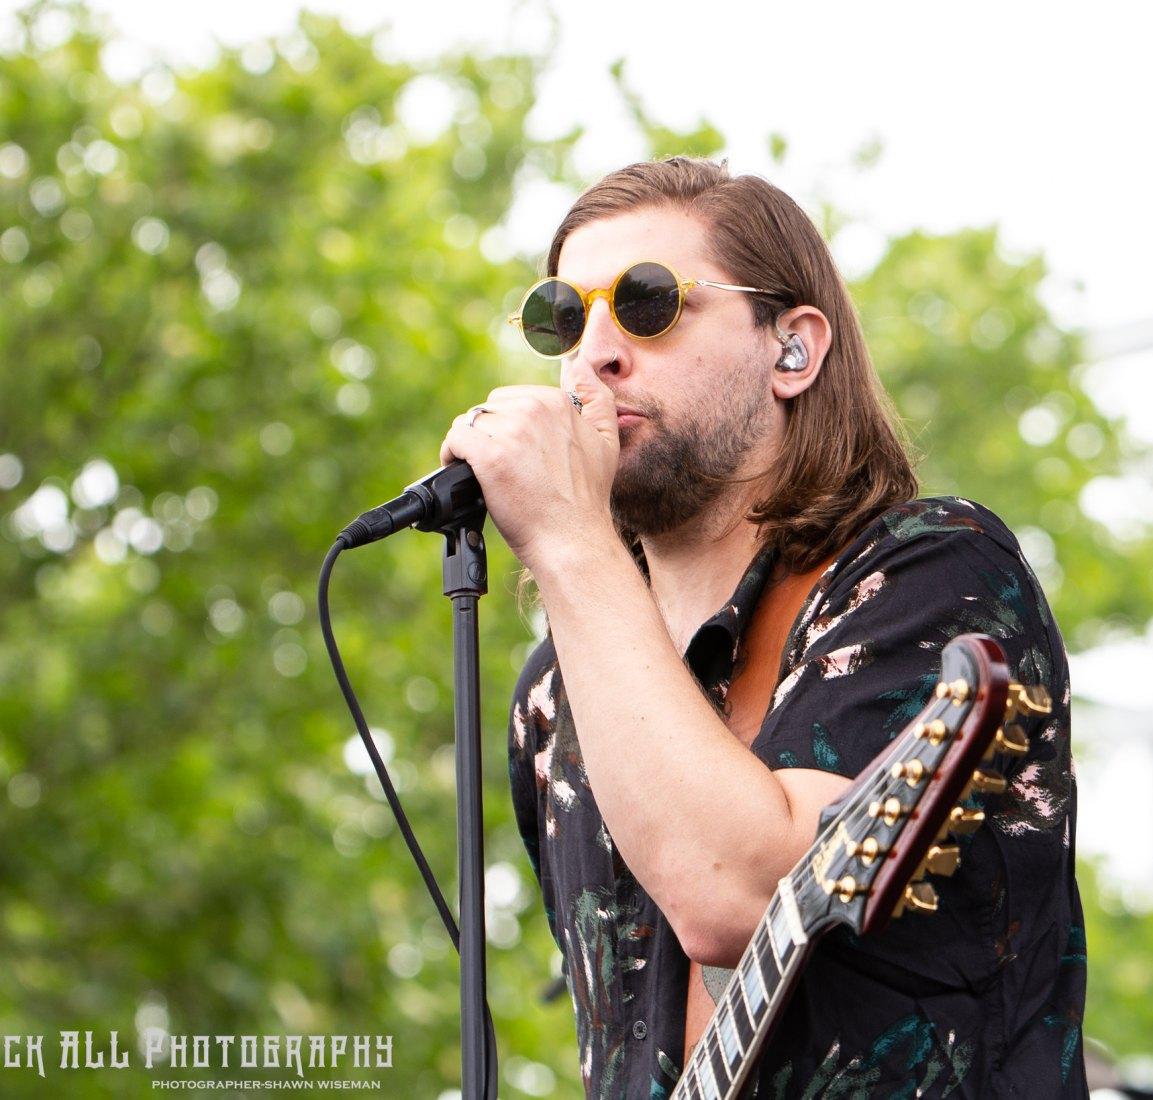 WELSHY ARMS - Bunbury Music Festival 2018 - 6/2/18 - Cincinnati Ohio